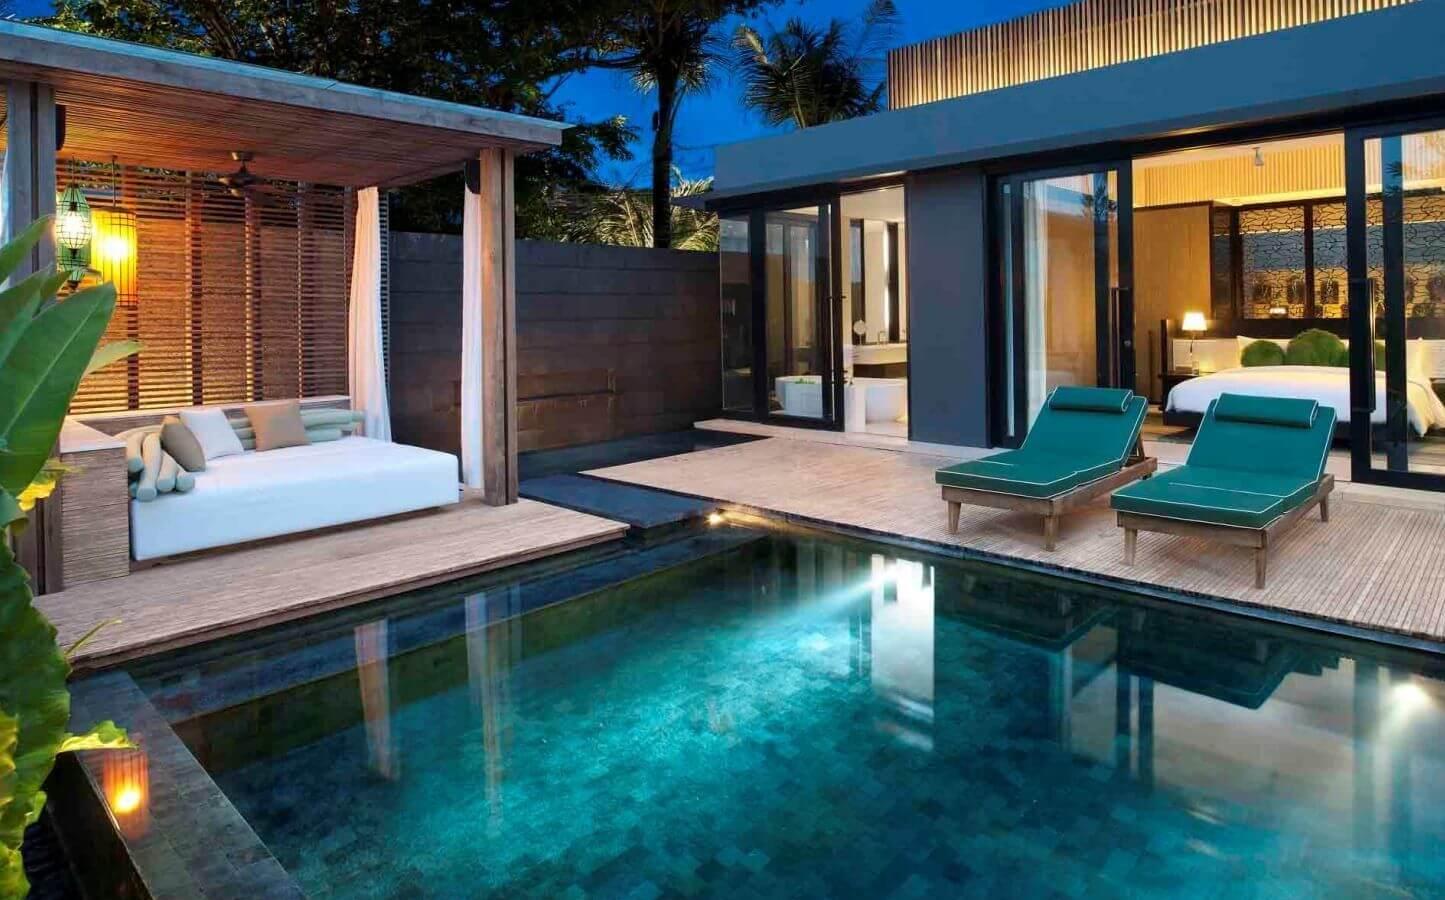 W Bali Villas